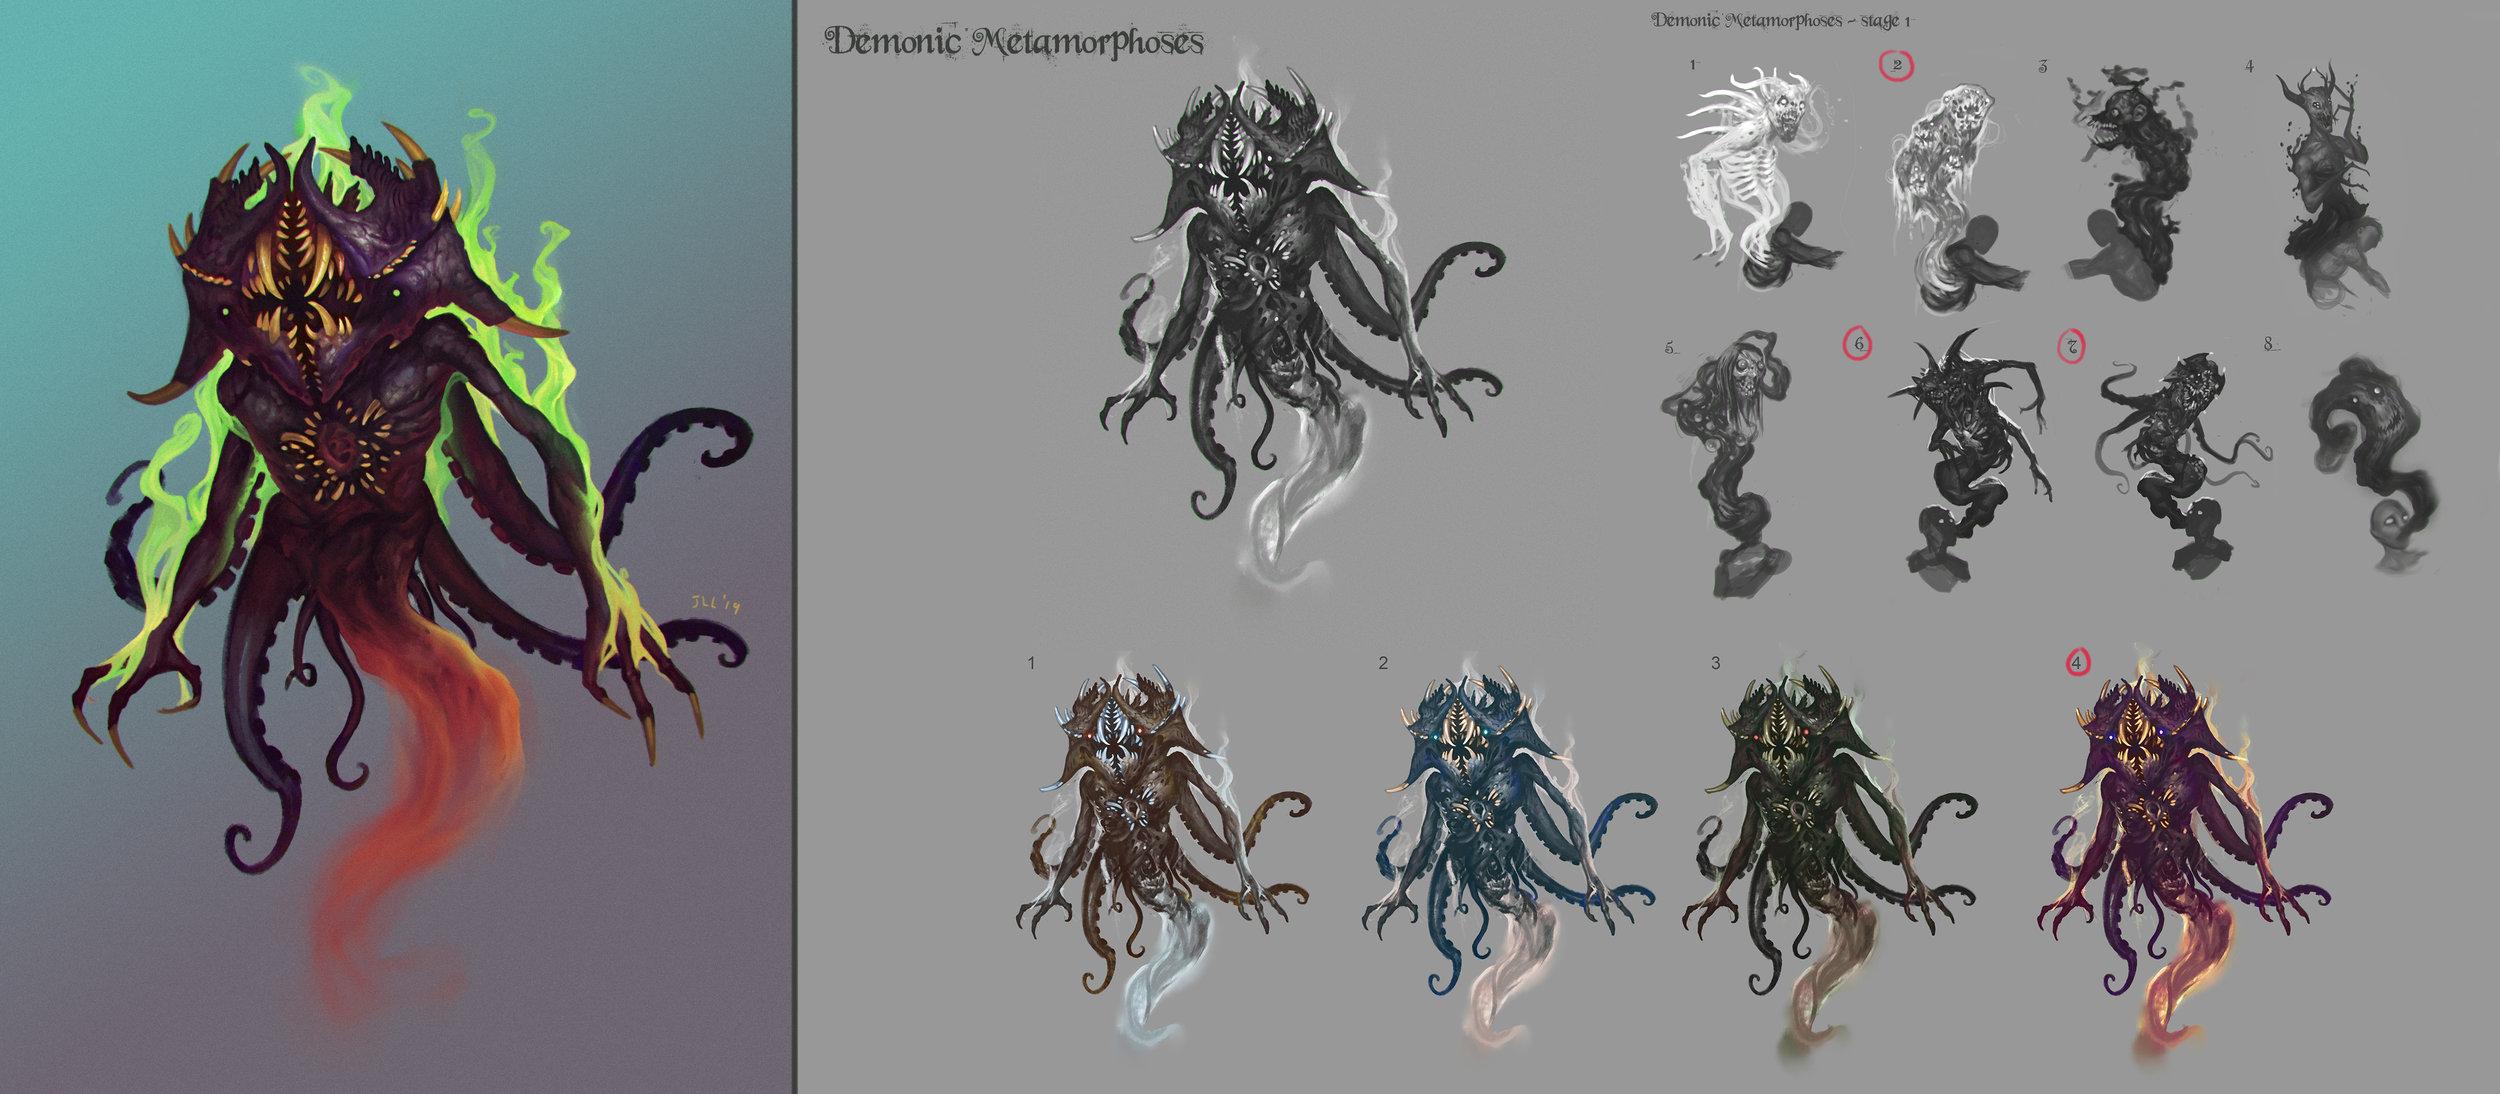 Demons_part2-Recovered.jpg